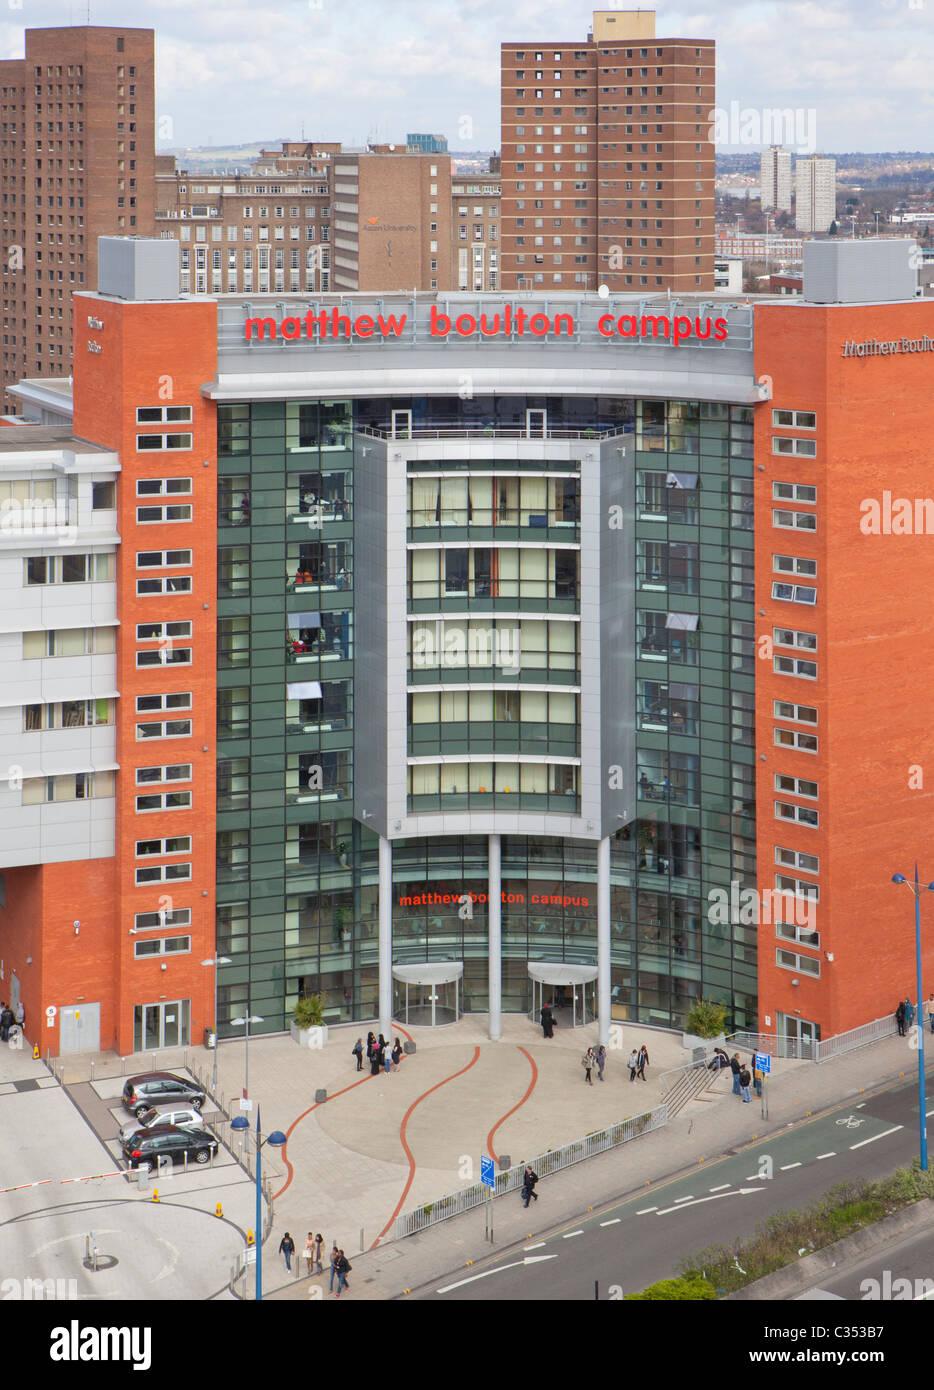 Matthew Boulton College, Birmingham, West Midlands. Matthew Boulton Campus. - Stock Image